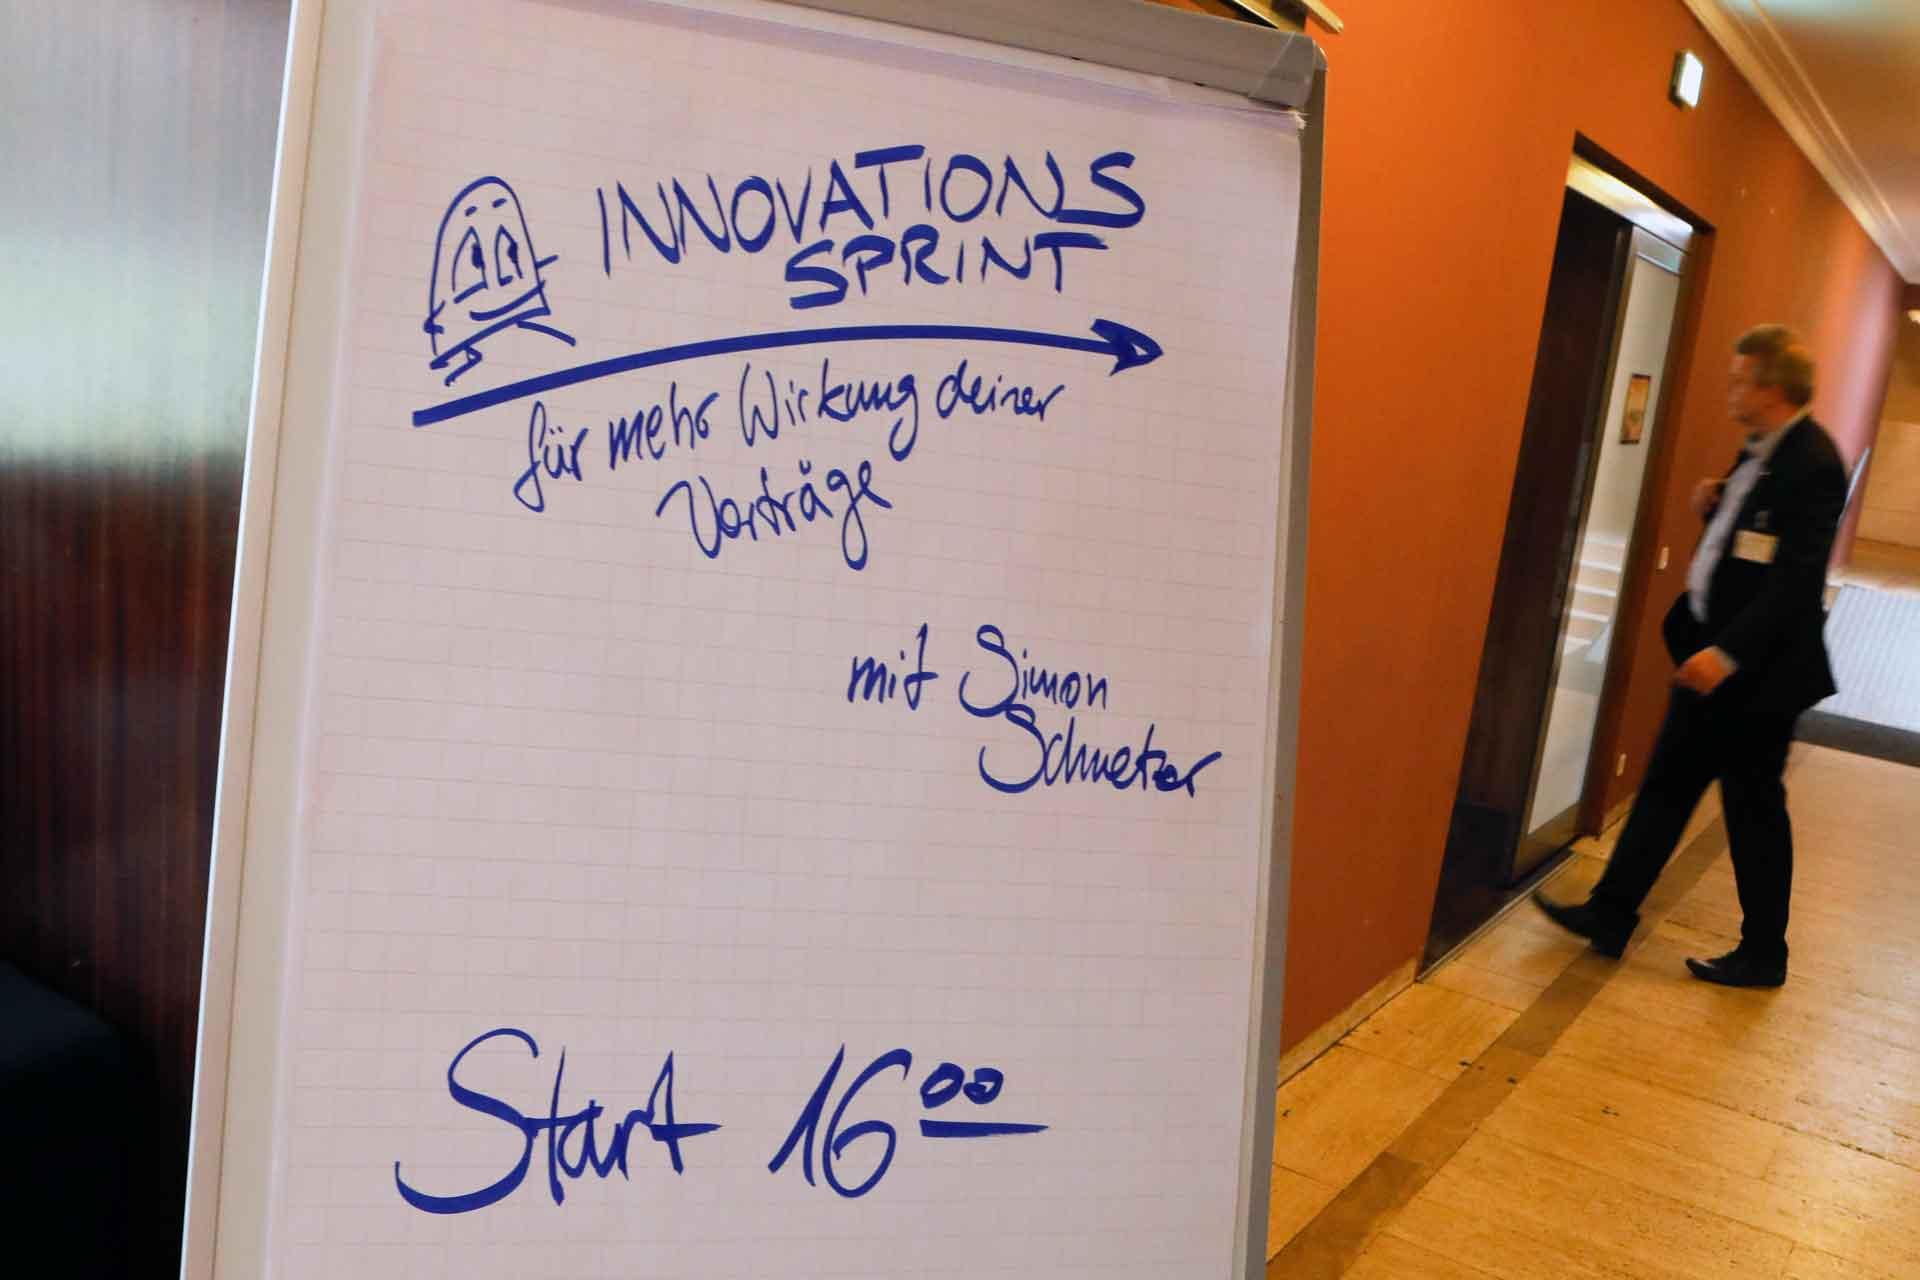 Eingang Innovationssprint Simon Schnetzer - GSA Winterkonferenz 2019